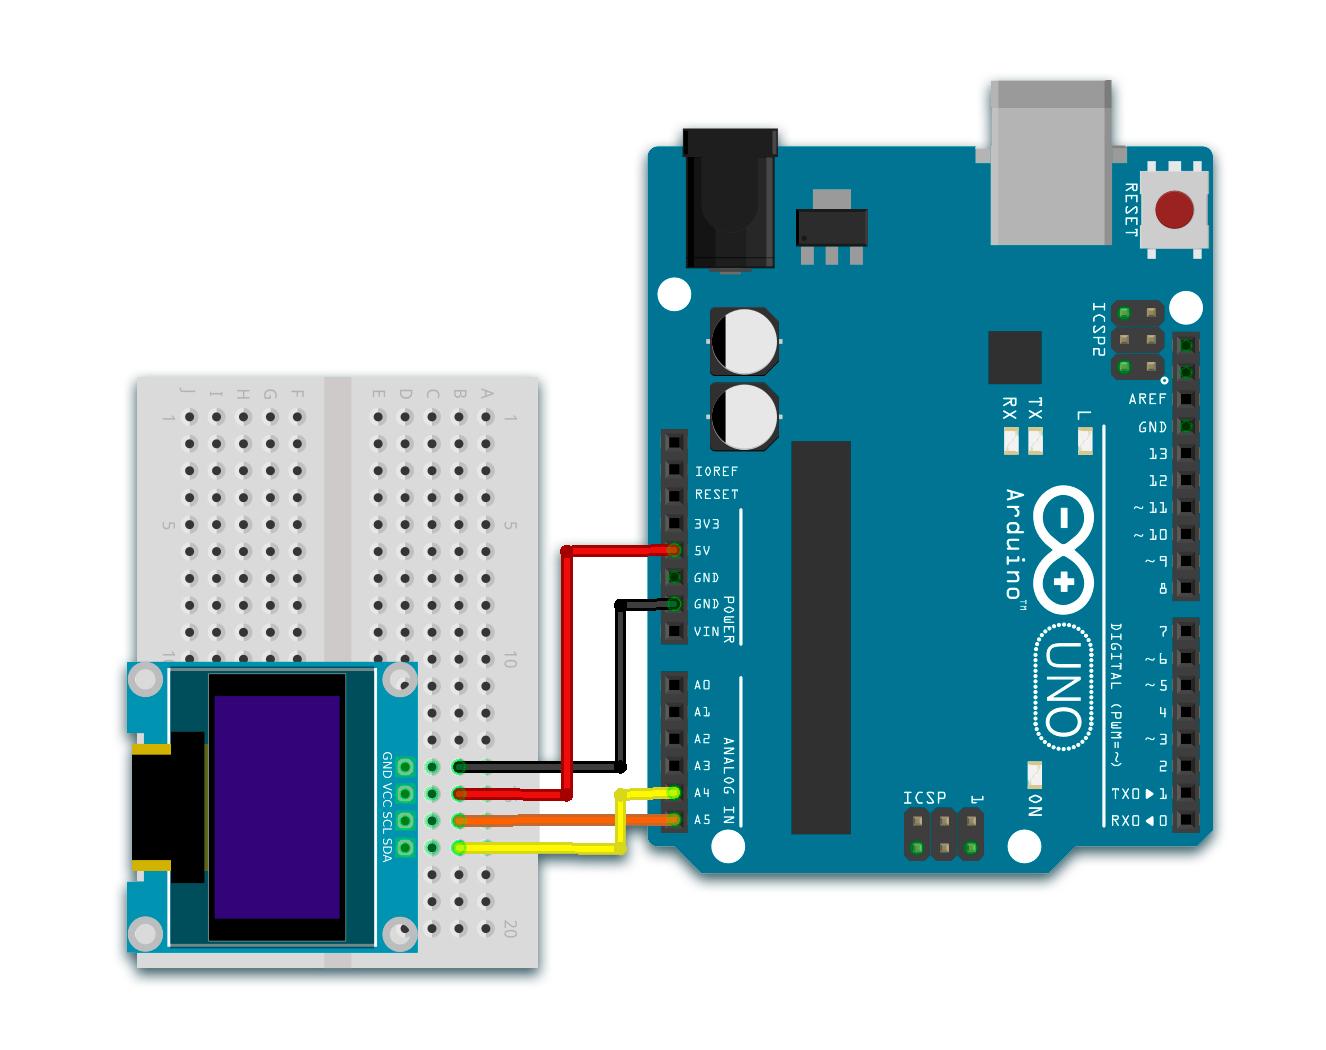 OLED I2C 128 x 64 px - схема подключения к Arduino